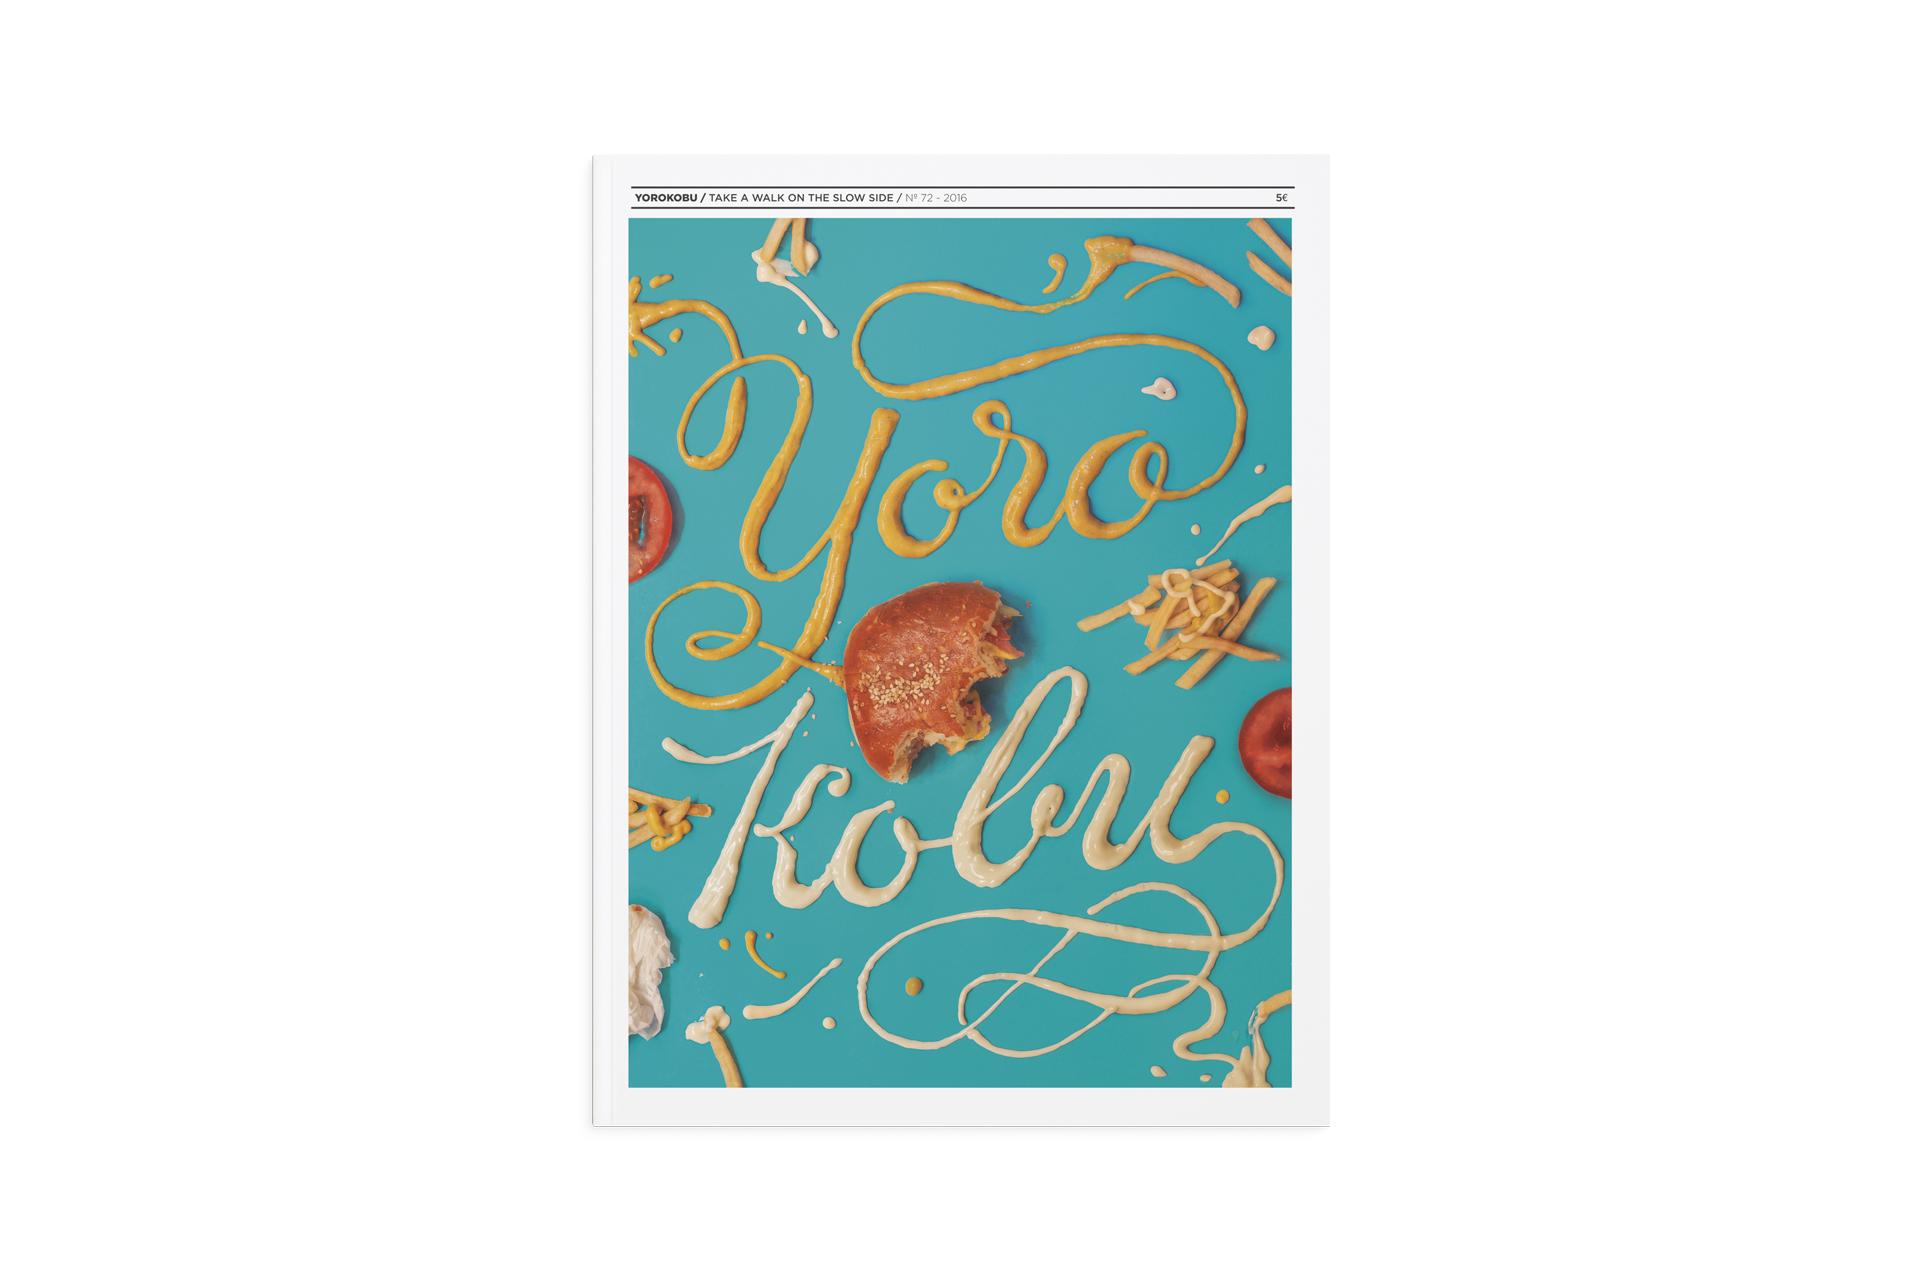 yorokobu_abril_2015_cover